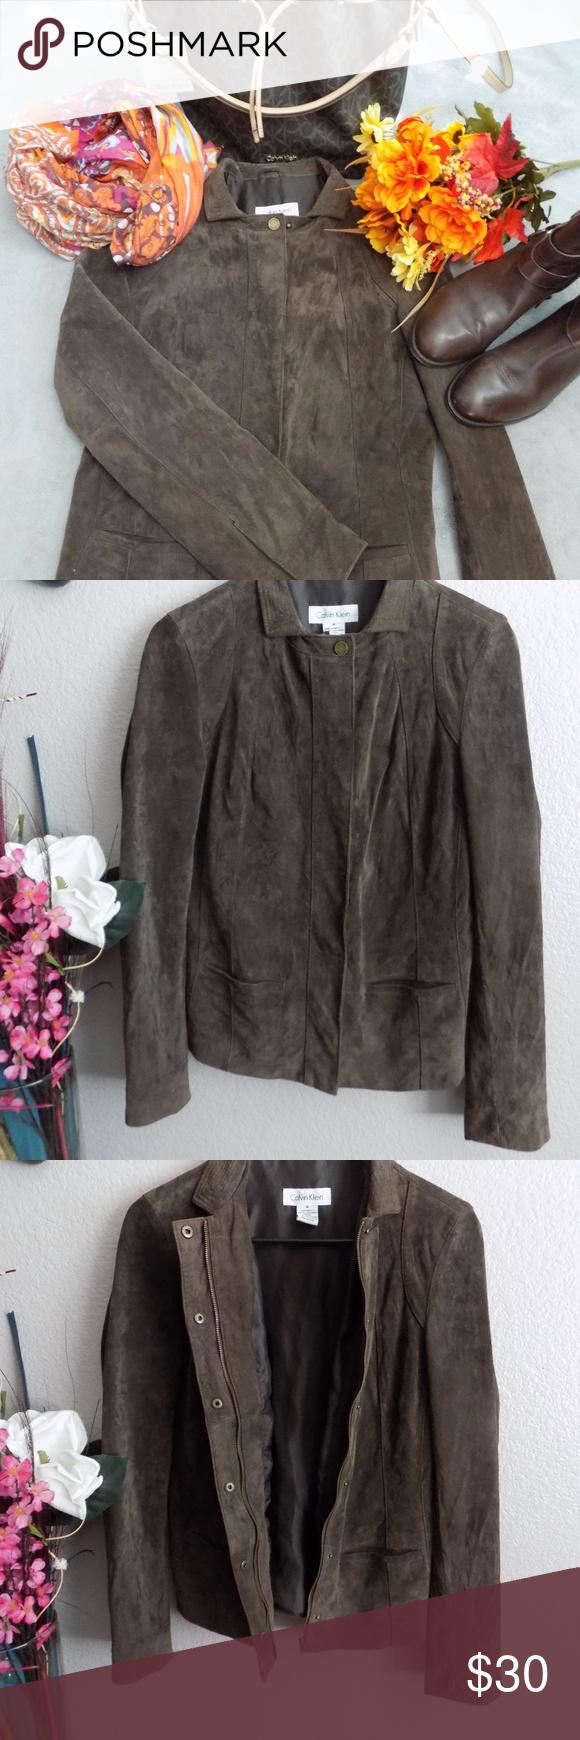 Calvin Klein Suede Leather Jacket Hardly used jacket. Very